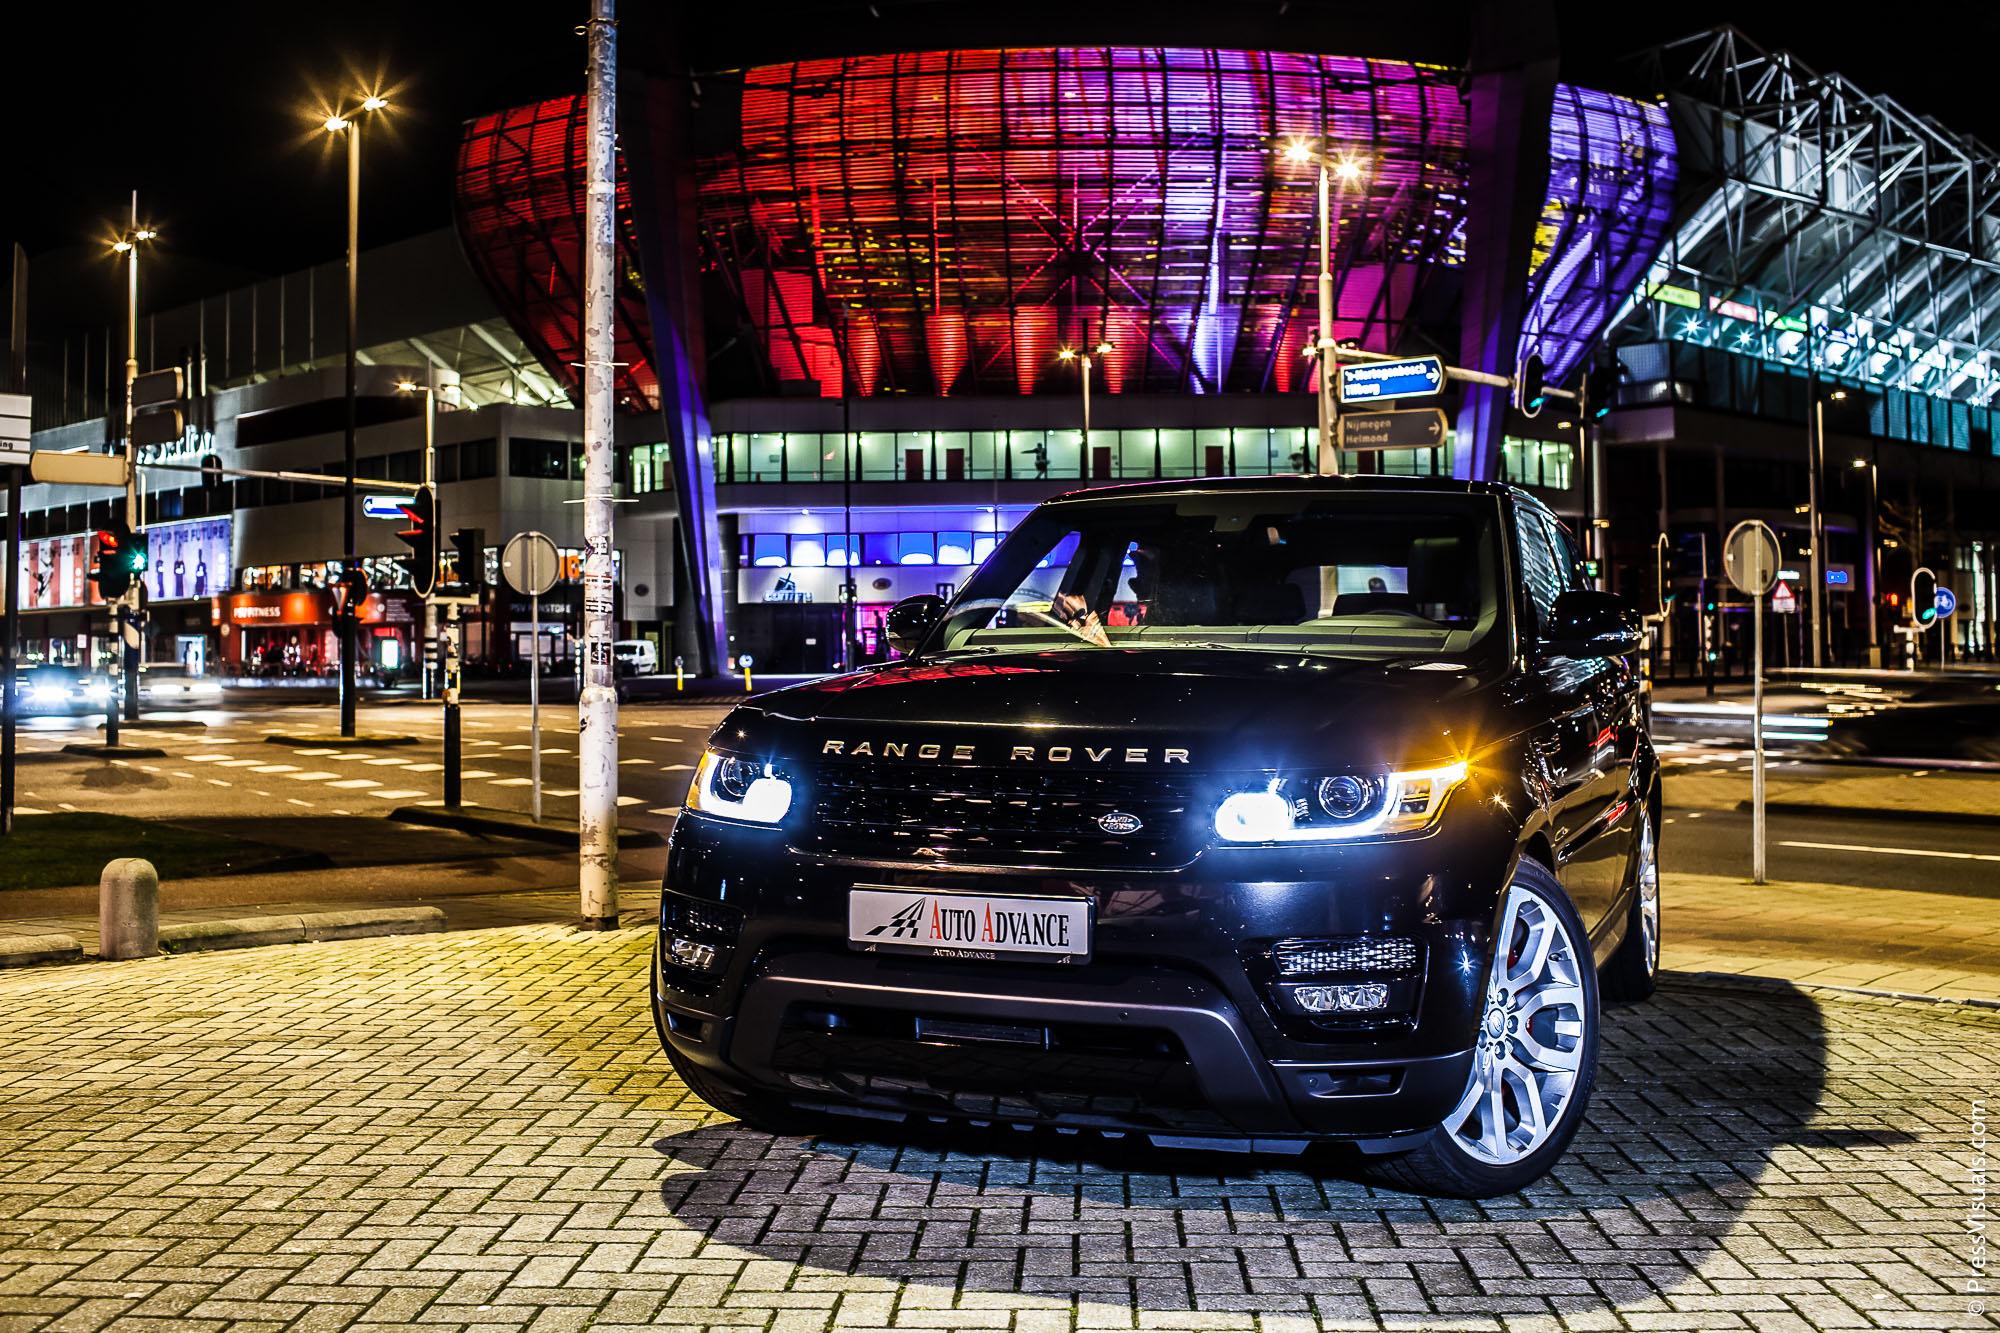 Range Rover Sport | Auto Advance | PSV Stadion Eindhoven